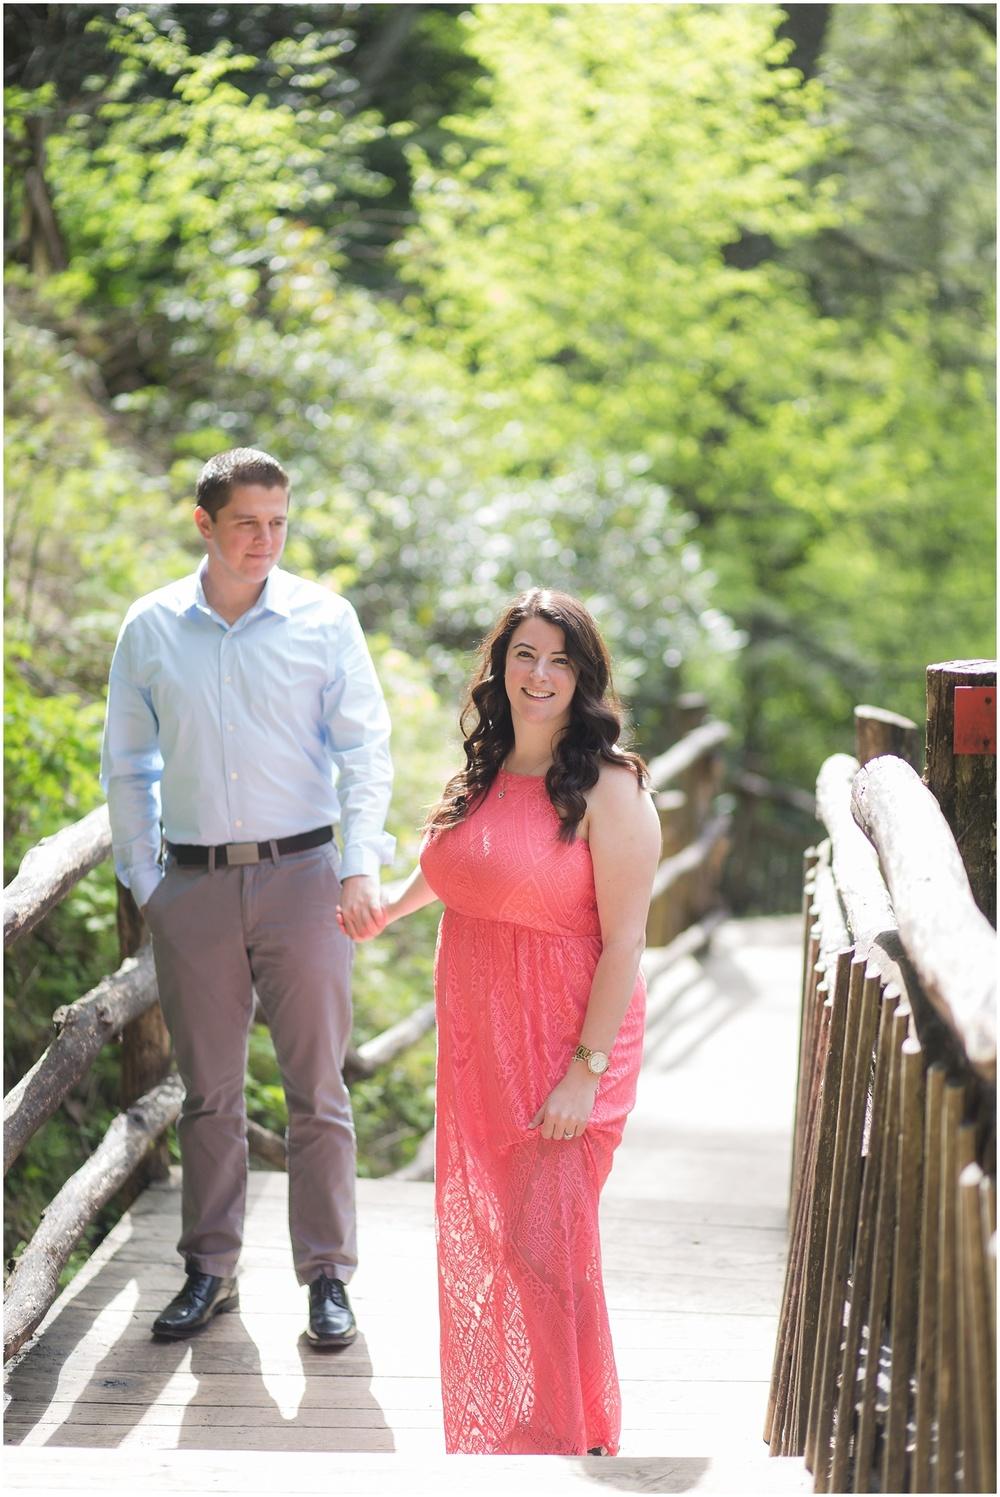 Megan Scott Engaged Northern Nj Wedding Photographer